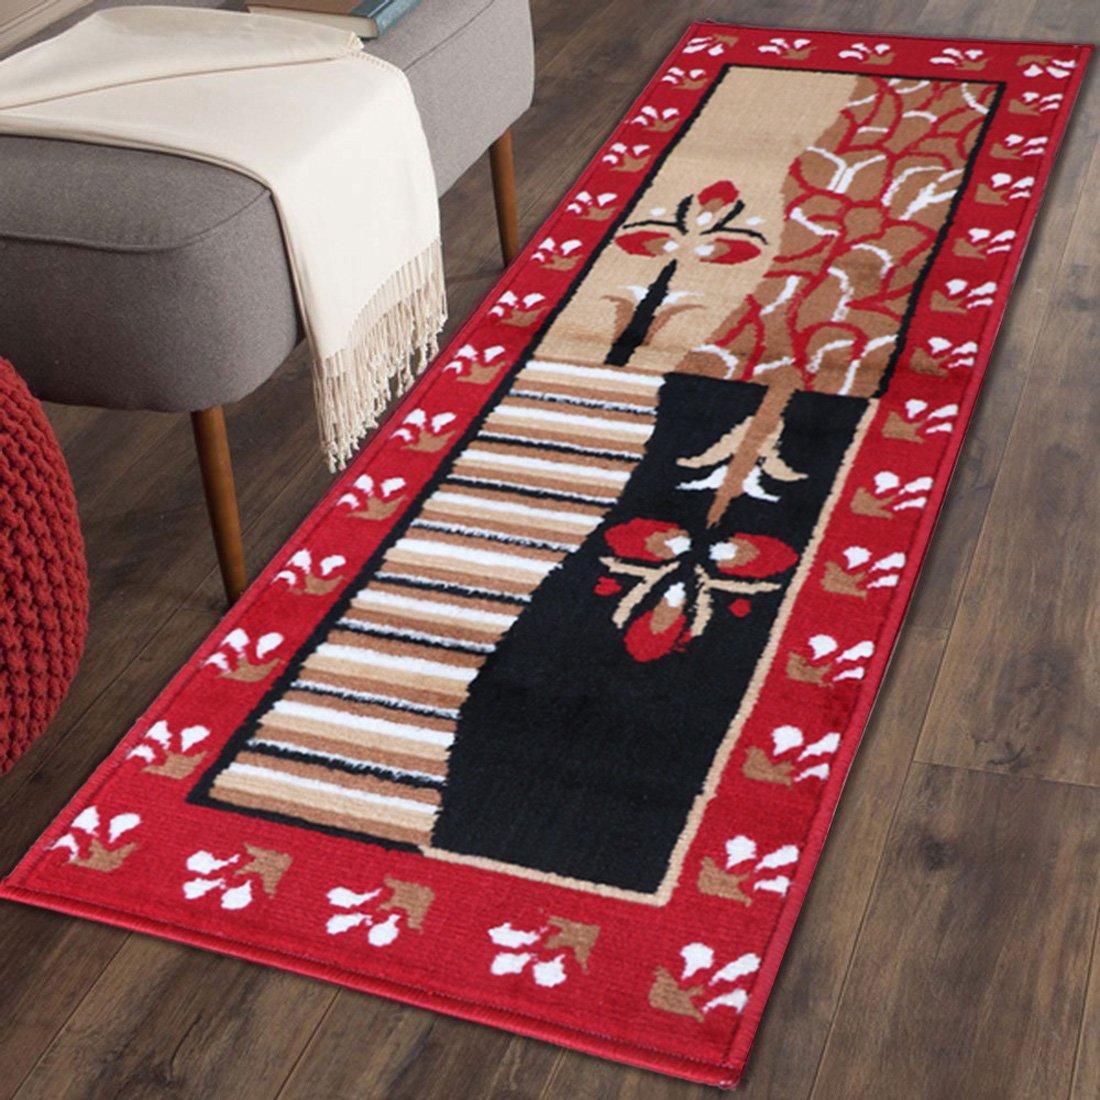 The Home Talk Traditional design bedside runner/ rug/ passage rug, 50 x 150 CM, Vascose, soft, Best for bedroom/living room/passage- RED